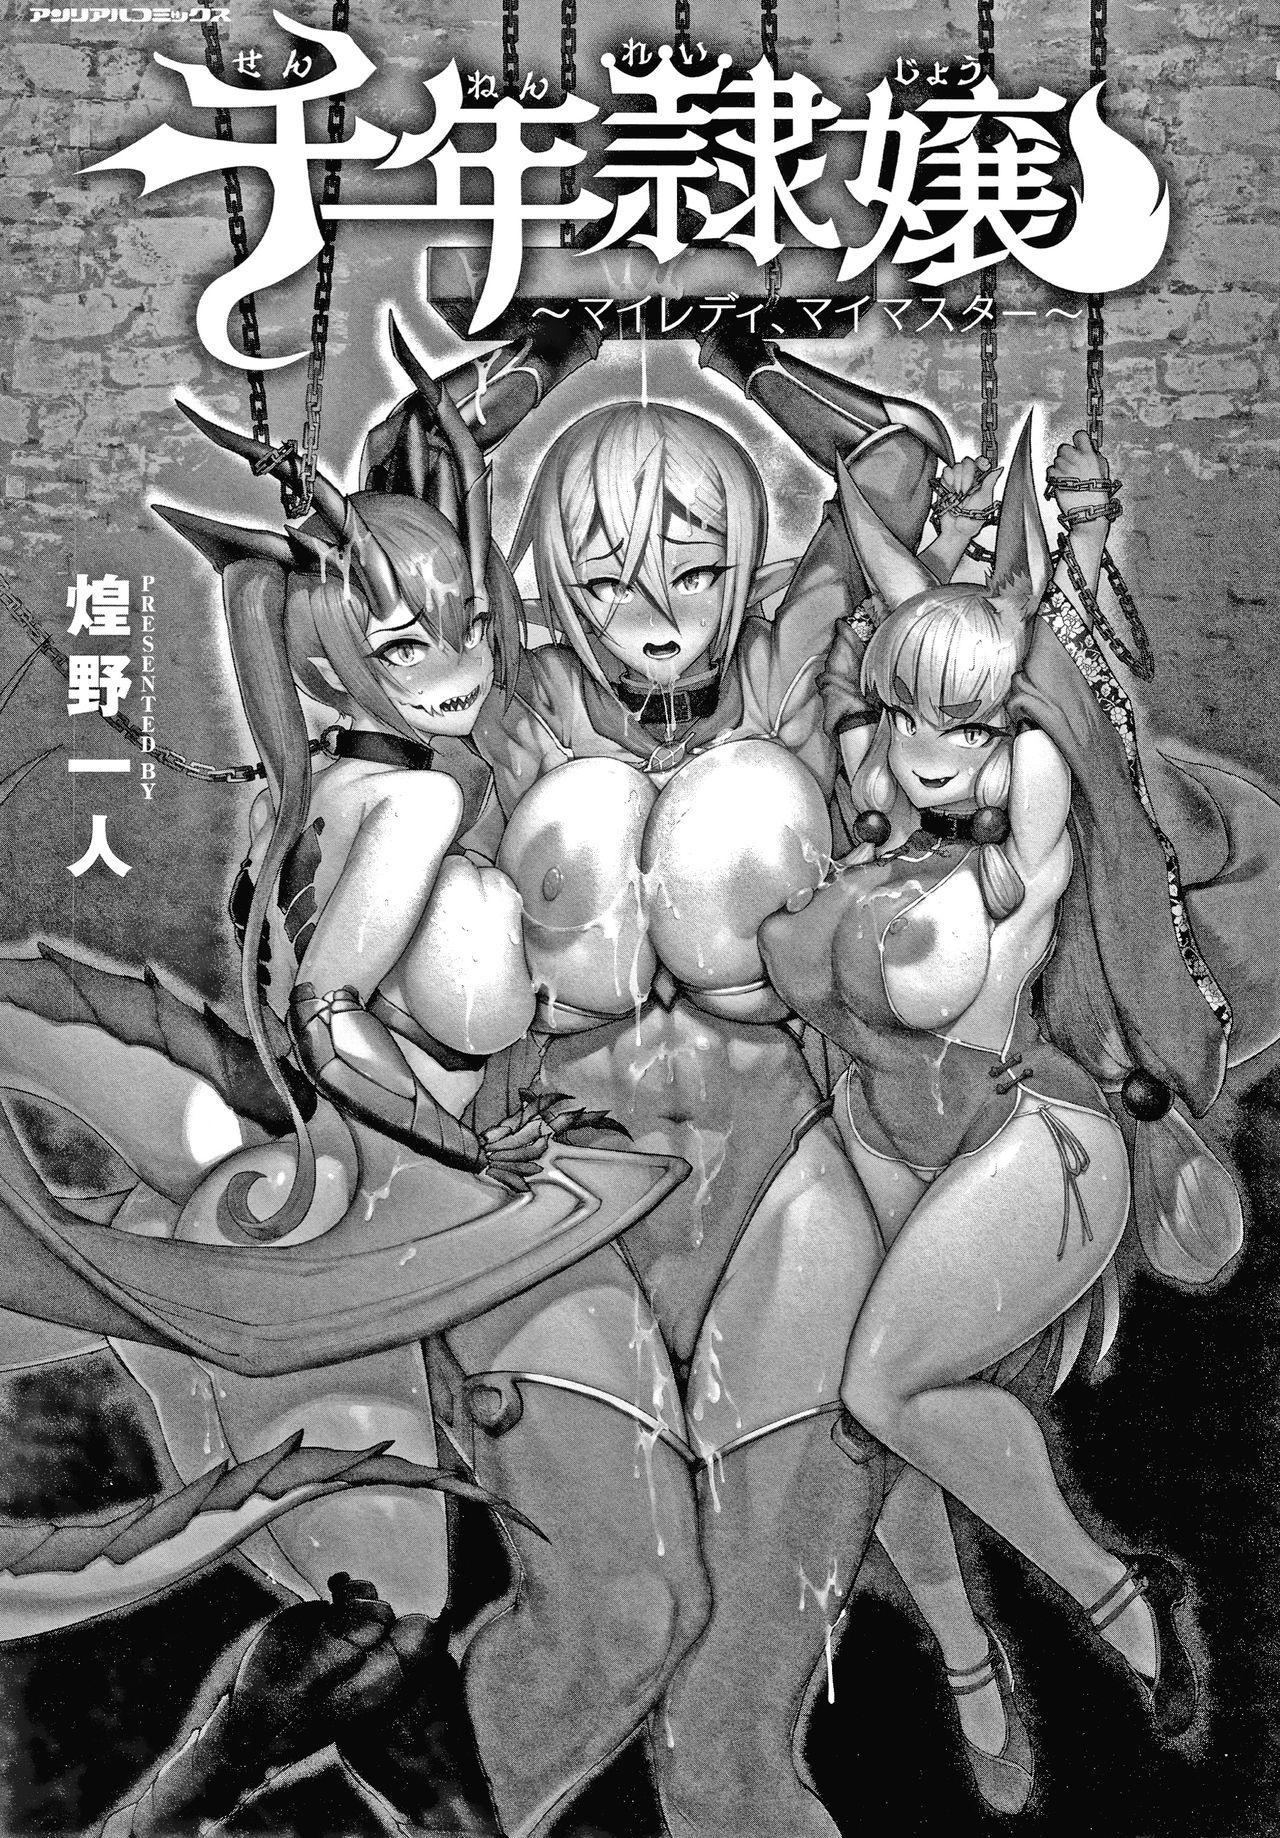 [Fan no Hitori] Sennen Reijou ~ My Lady, My Master ~  Ch.1-3 [English] {Doujins.com} 3